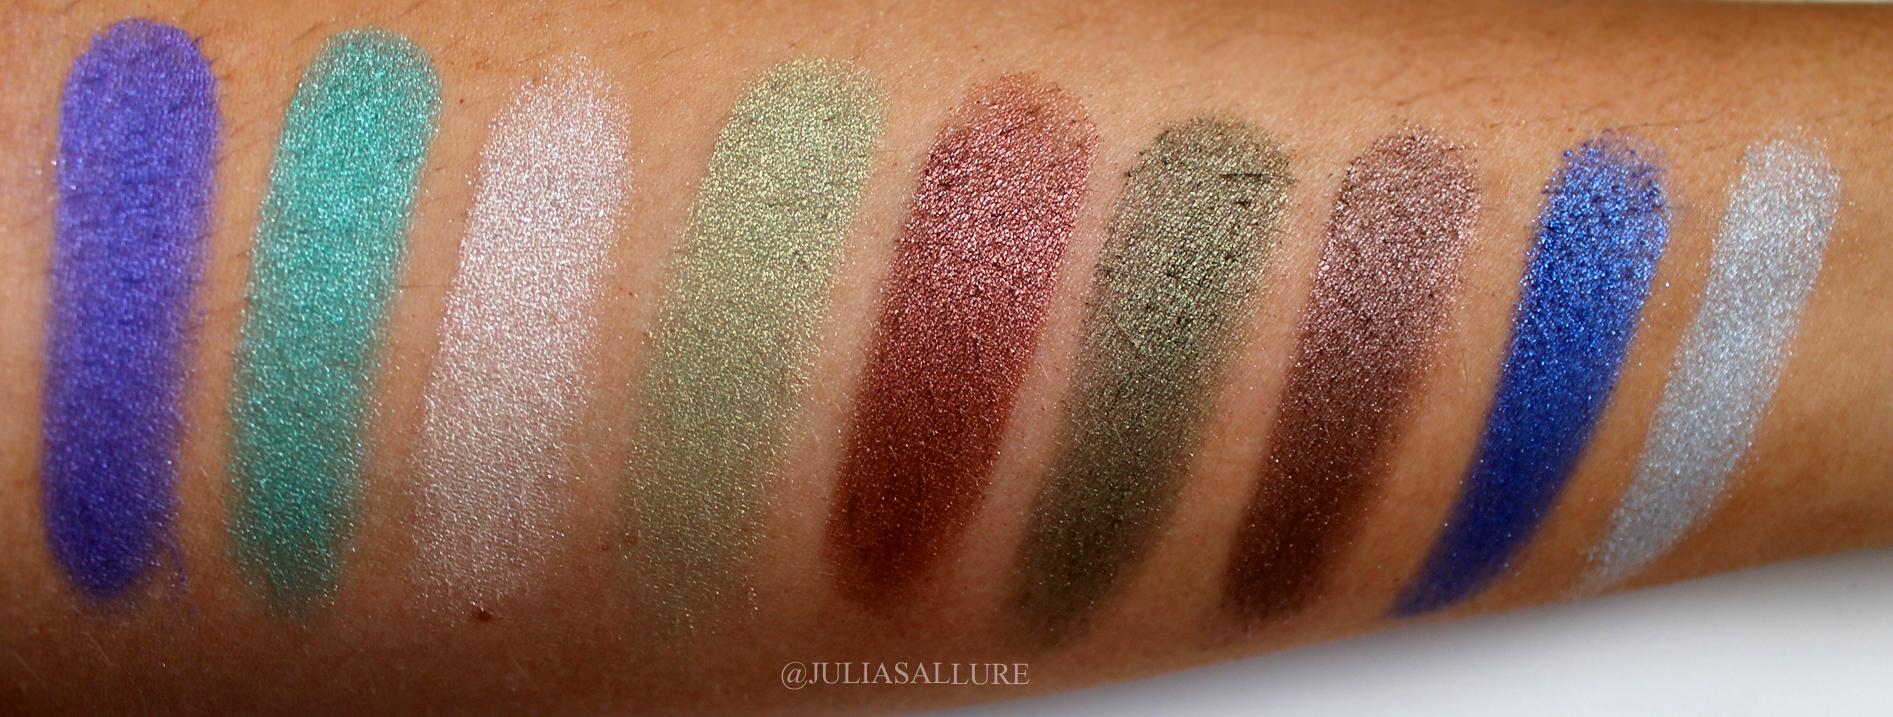 Wild Child Baked Eyeshadow Palette by BH Cosmetics #9